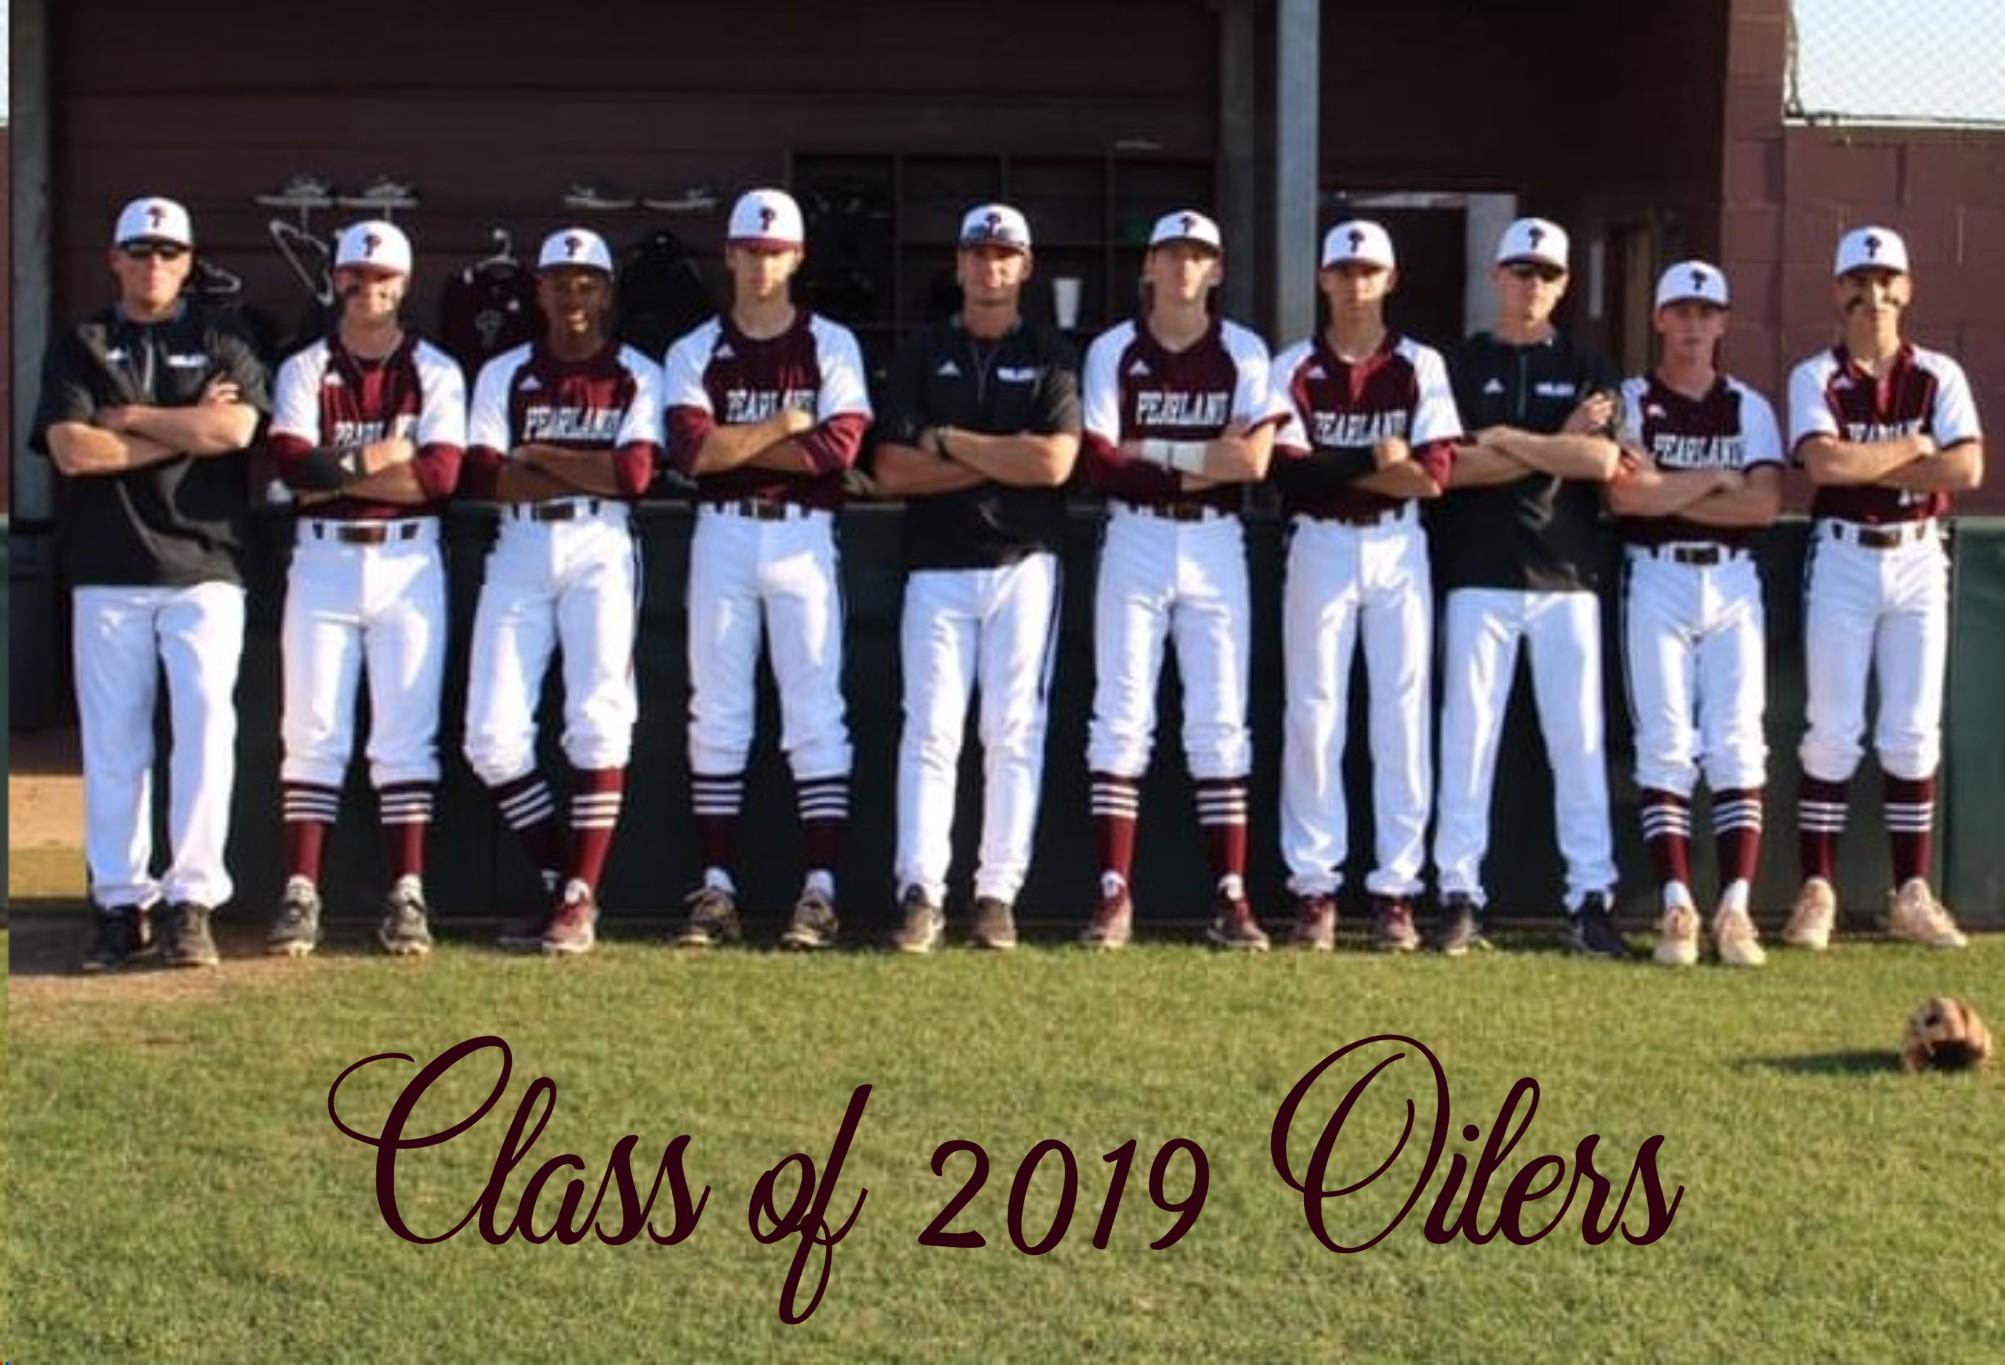 2019 Seniors and coaches.jpg